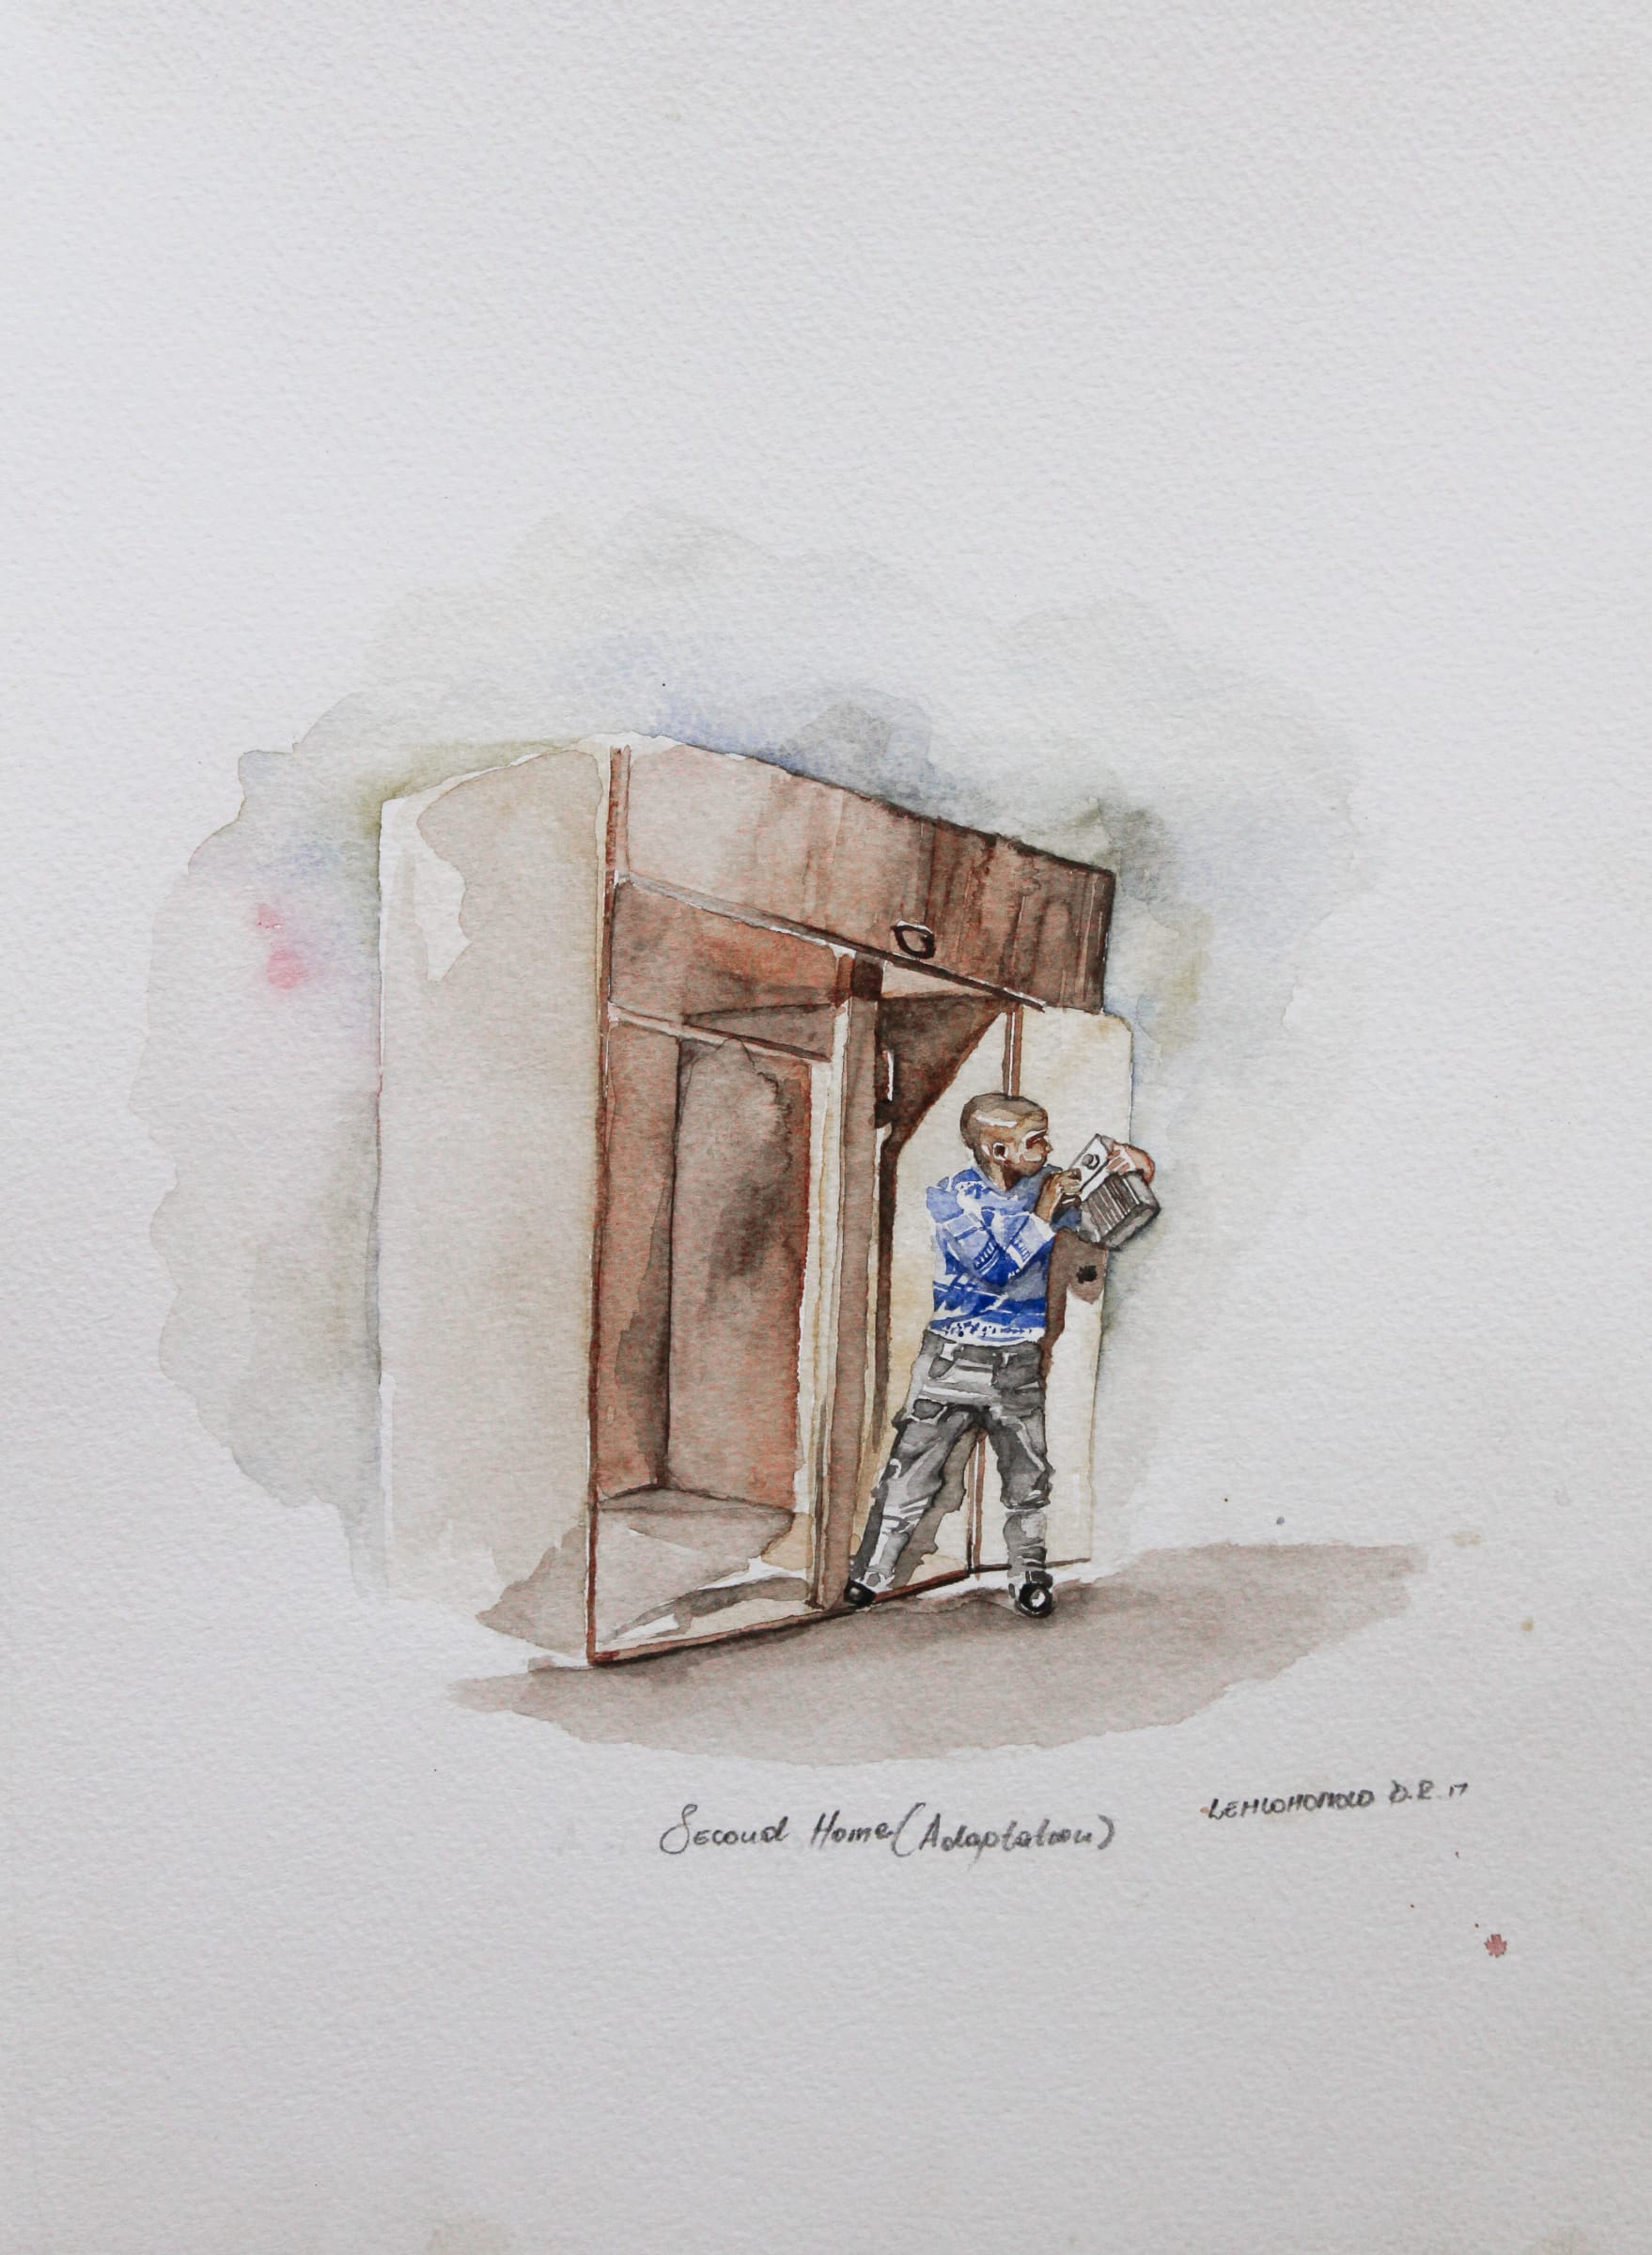 <span class=&#34;link fancybox-details-link&#34;><a href=&#34;/artists/34-lehlohonolo-dhlamini/works/1467-lehlohonolo-dhlamini-second-home-adaptation-2017/&#34;>View Detail Page</a></span><div class=&#34;artist&#34;><strong>Lehlohonolo Dhlamini</strong></div> <div class=&#34;title&#34;><em>Second Home (Adaptation)</em>, 2017</div> <div class=&#34;medium&#34;>Watercolour On Paper</div> <div class=&#34;dimensions&#34;>37.5cm x 27.5cm</div><div class=&#34;price&#34;>R2,160.00</div>